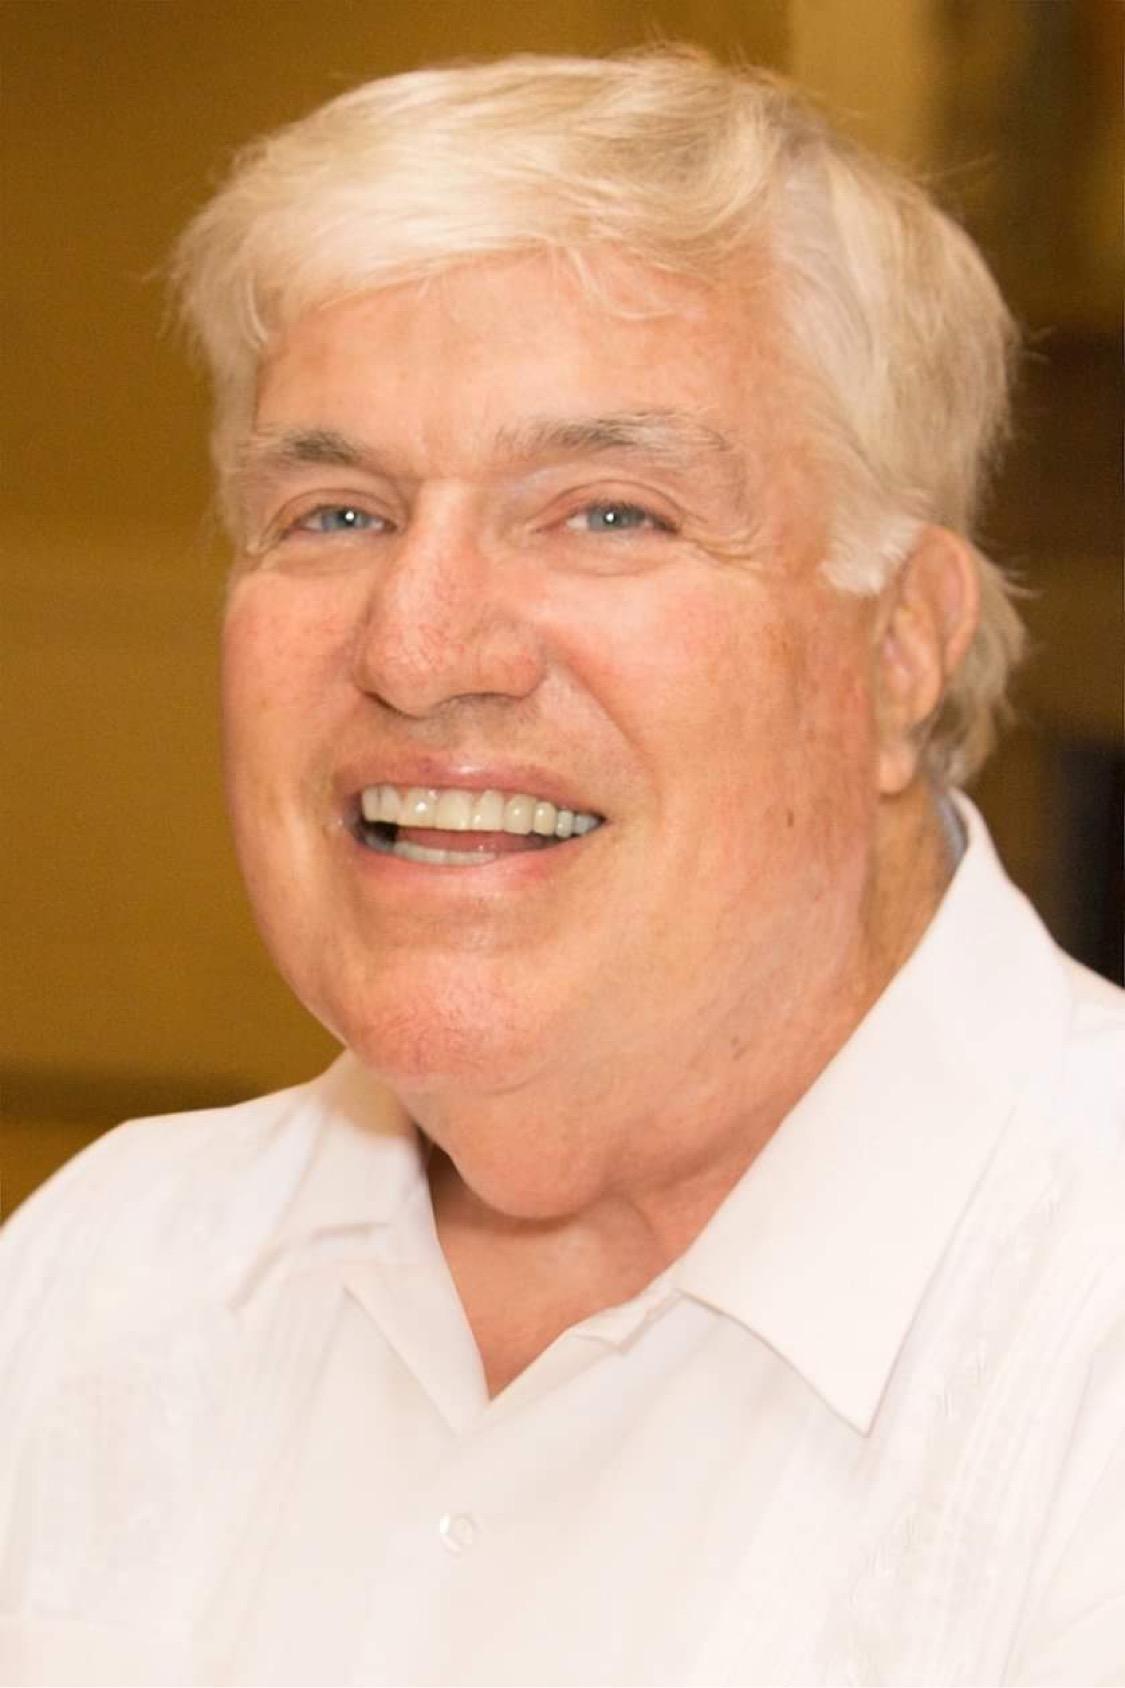 Portrait of a grinning Tom O'Dea.